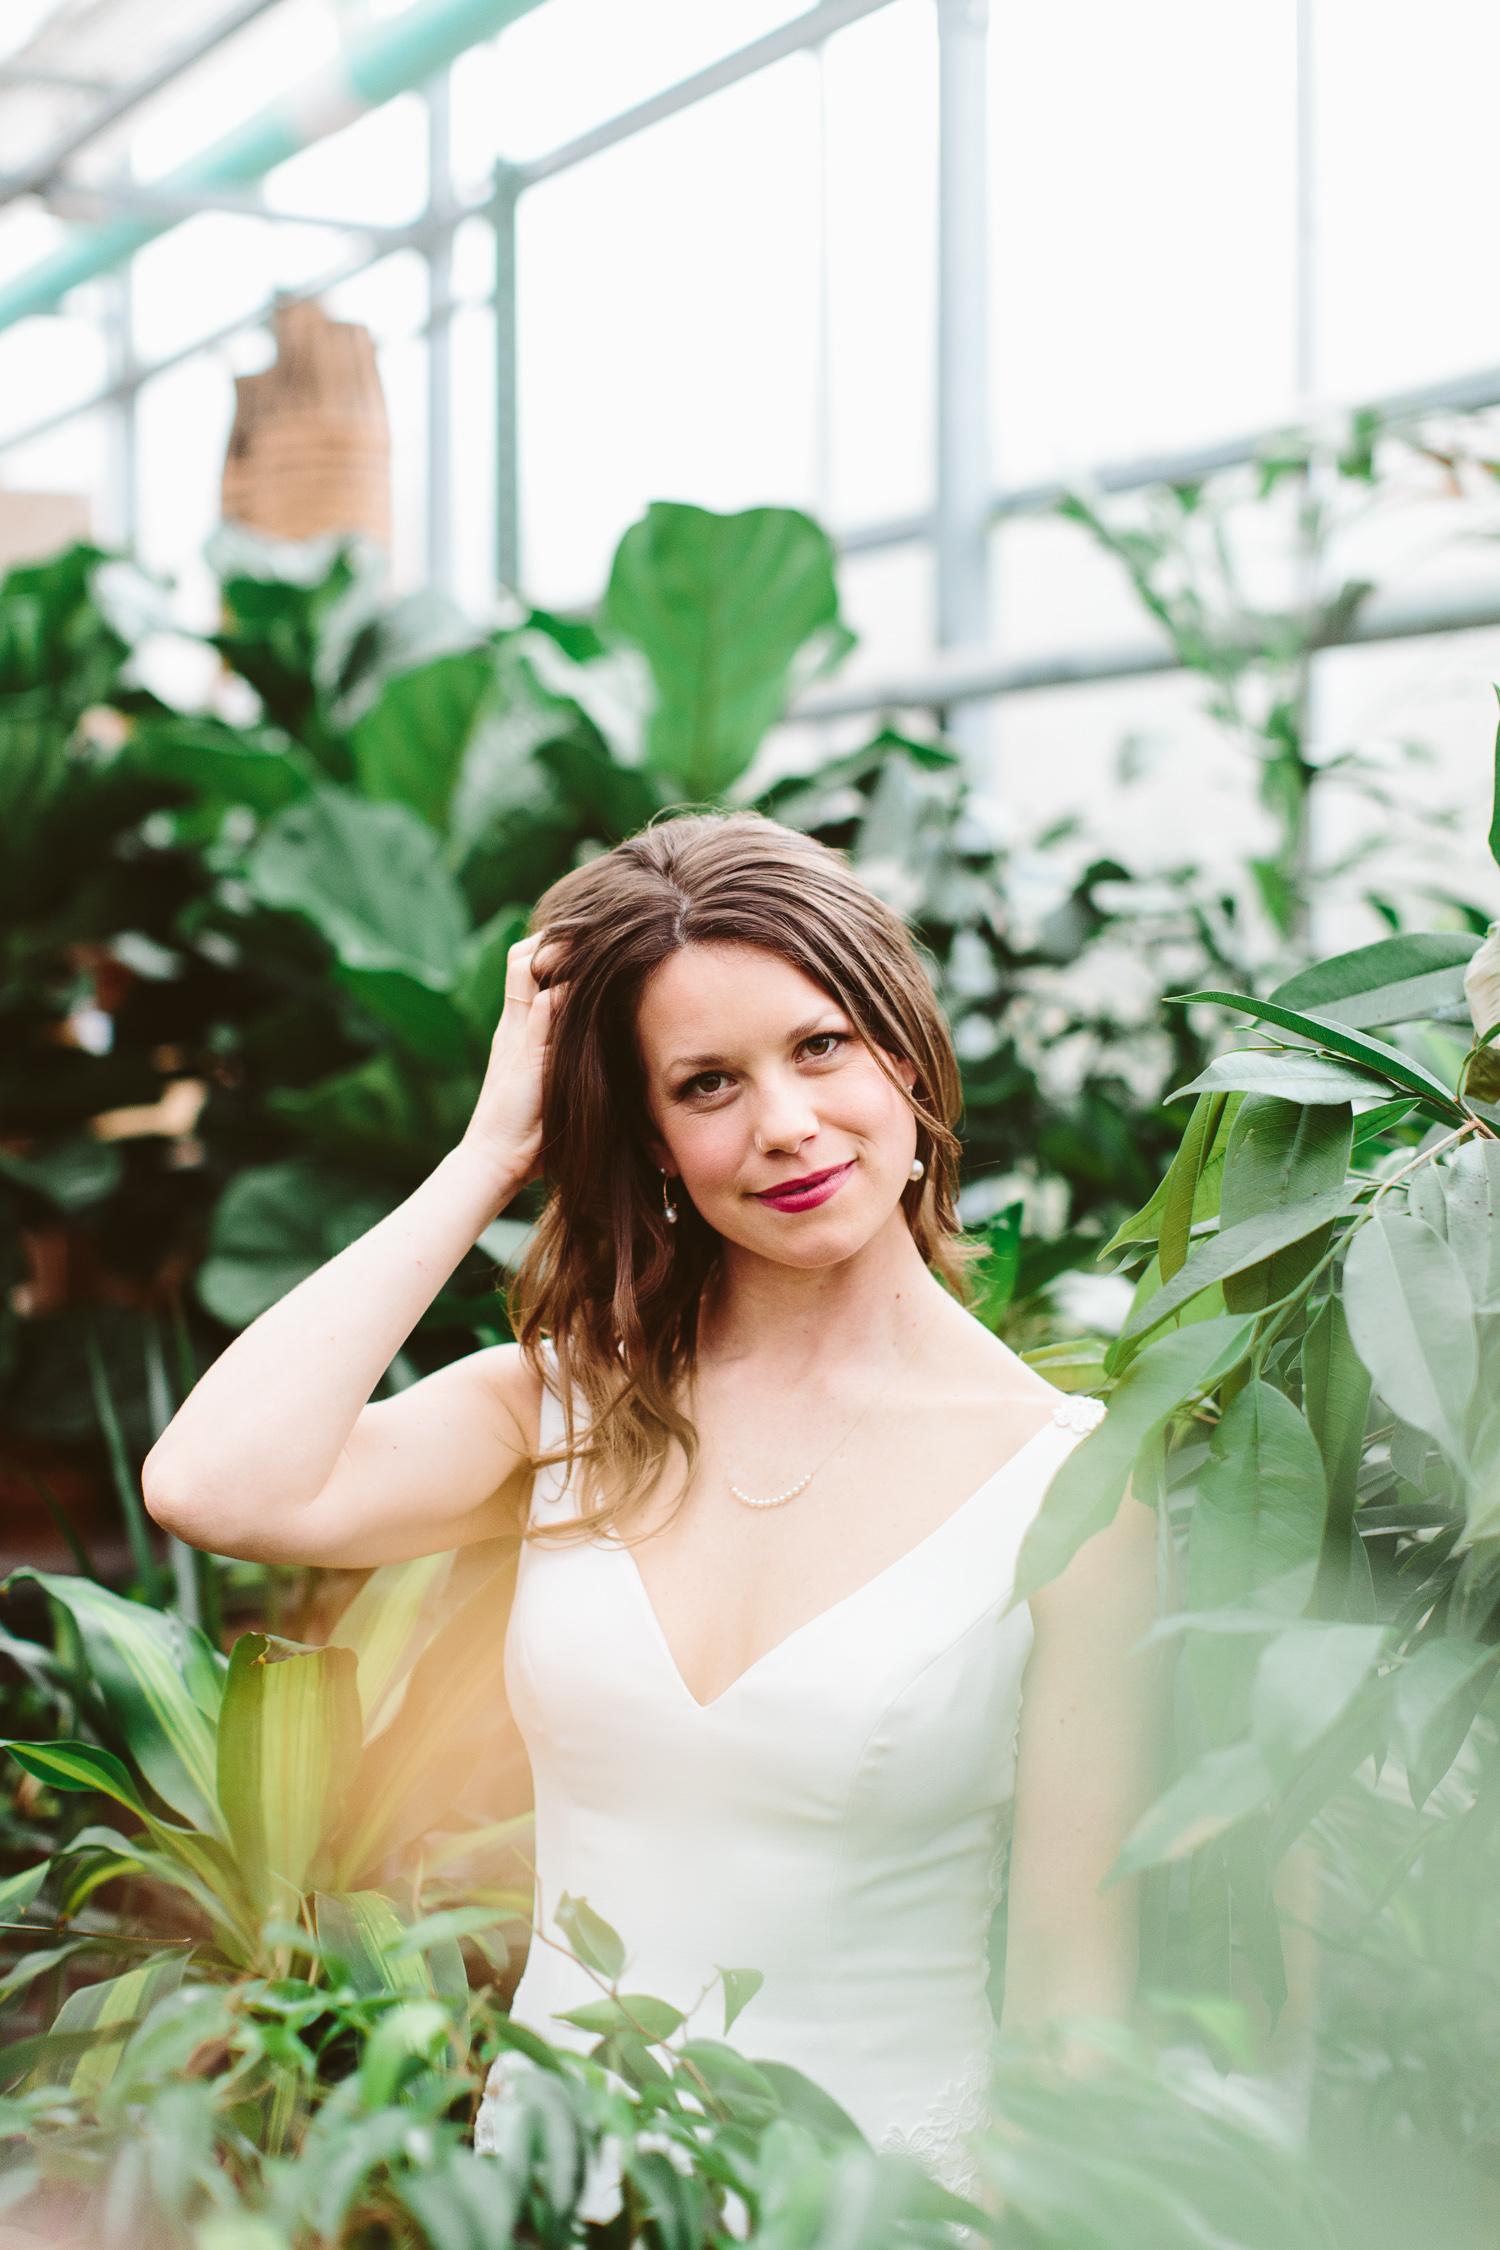 Cameron lee - Stanley's Greenhouse Bridal Portraits